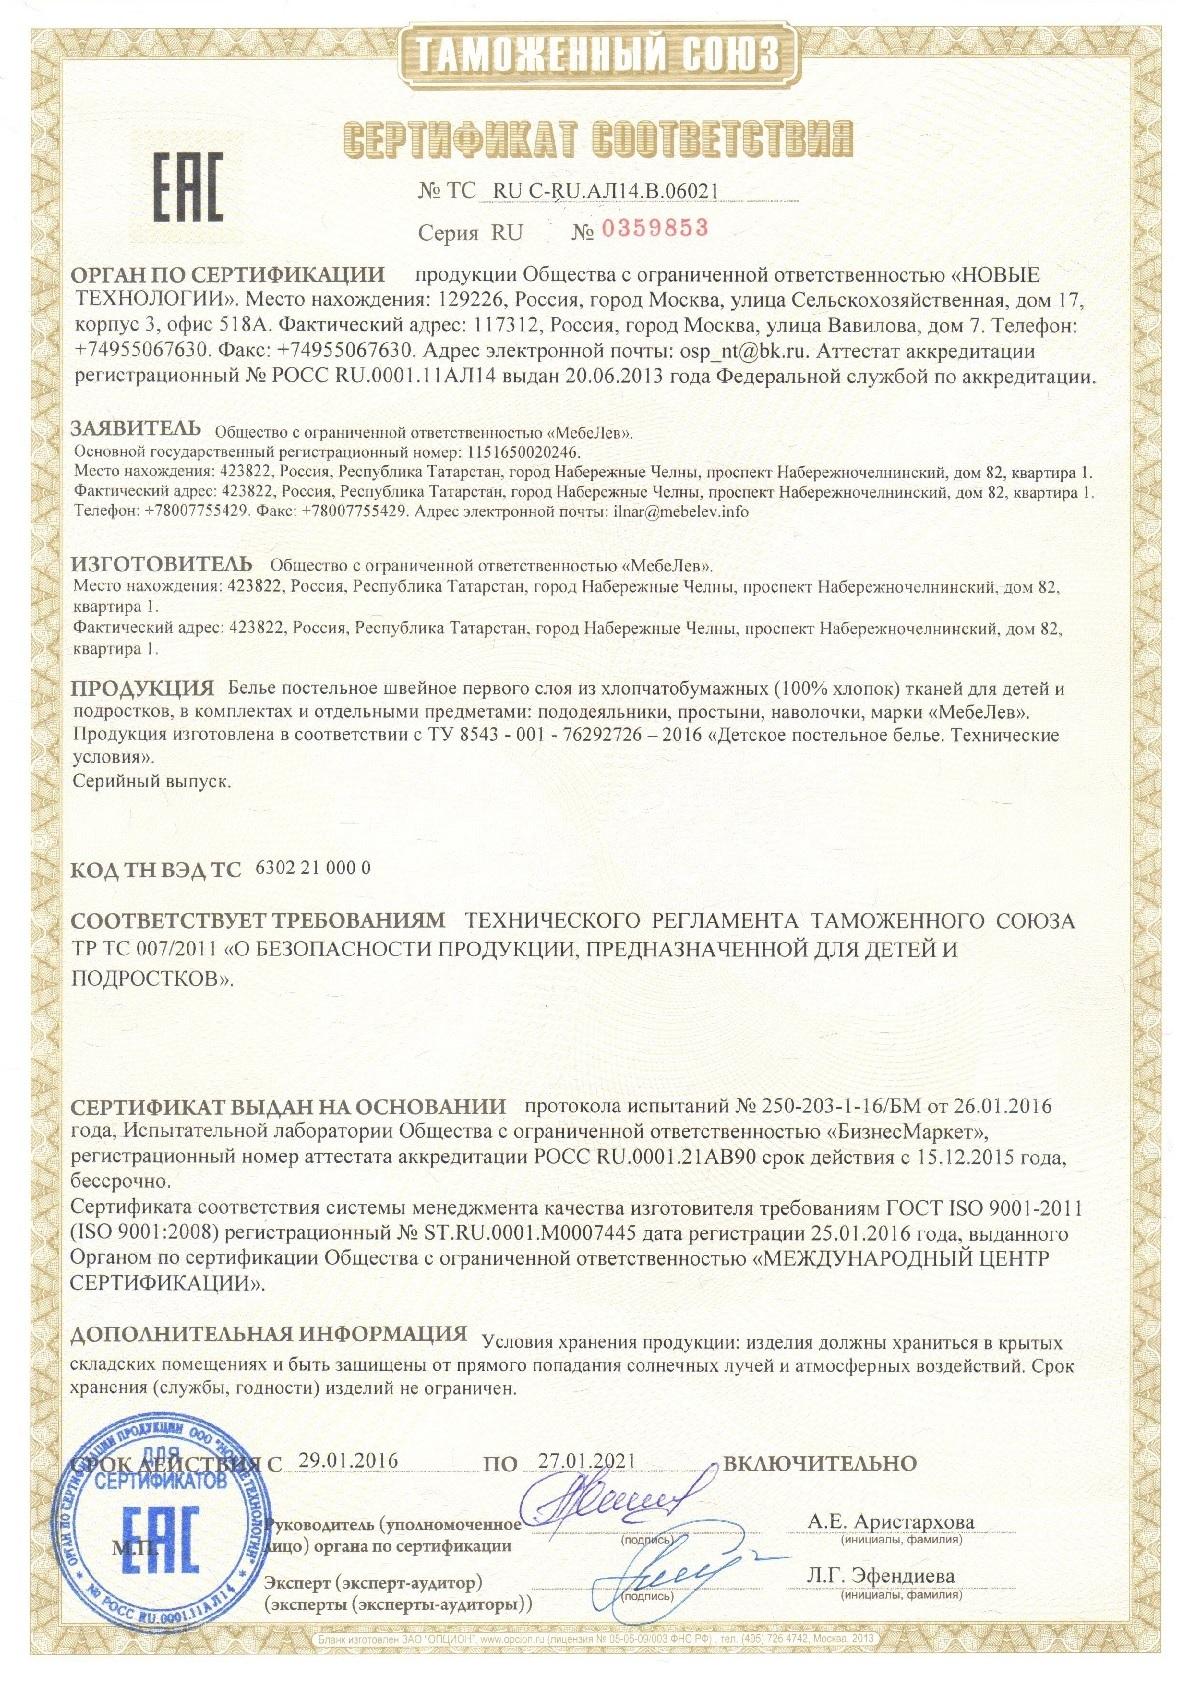 007_Сертификат_КПБ-001.jpg